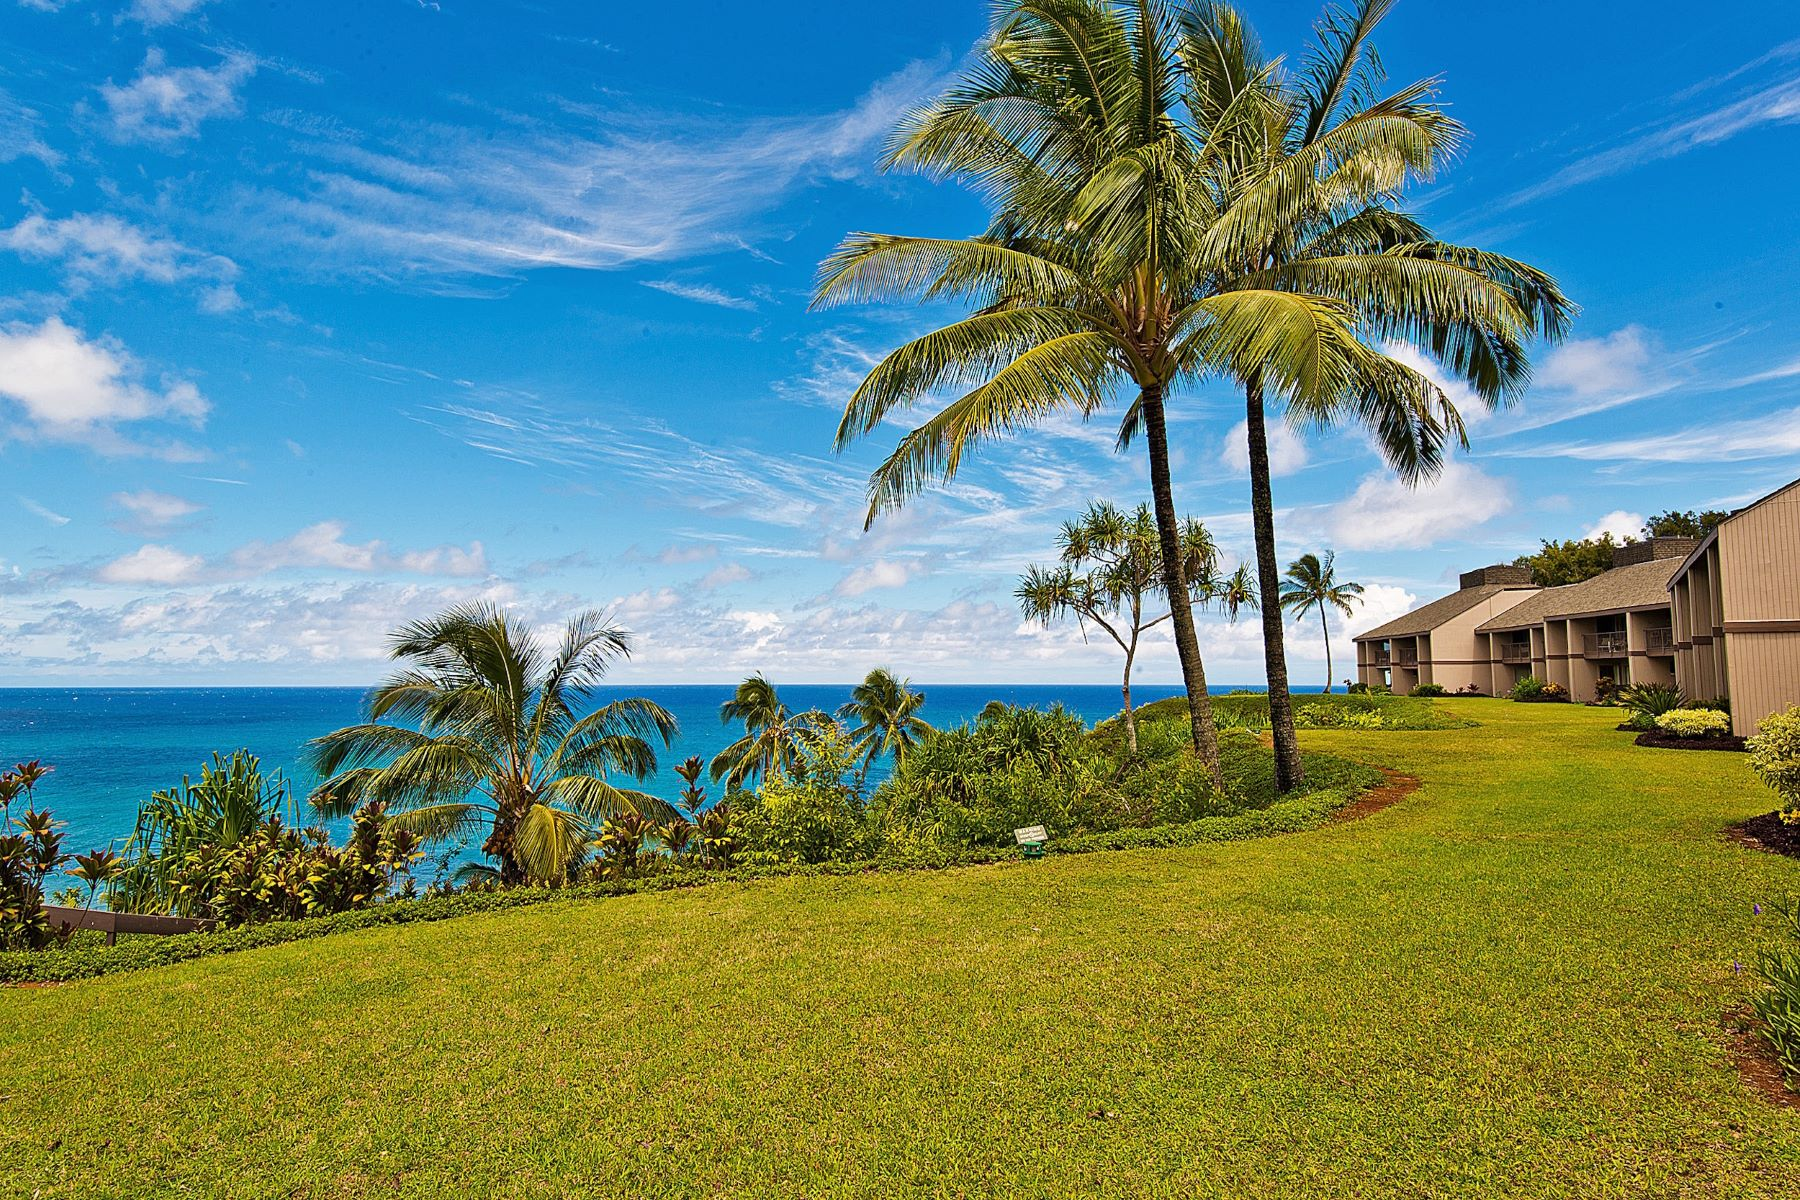 Condominium for Sale at Pali Ke Kua 5300 Ka Haku Road #107A Princeville, Hawaii, 96722 United States